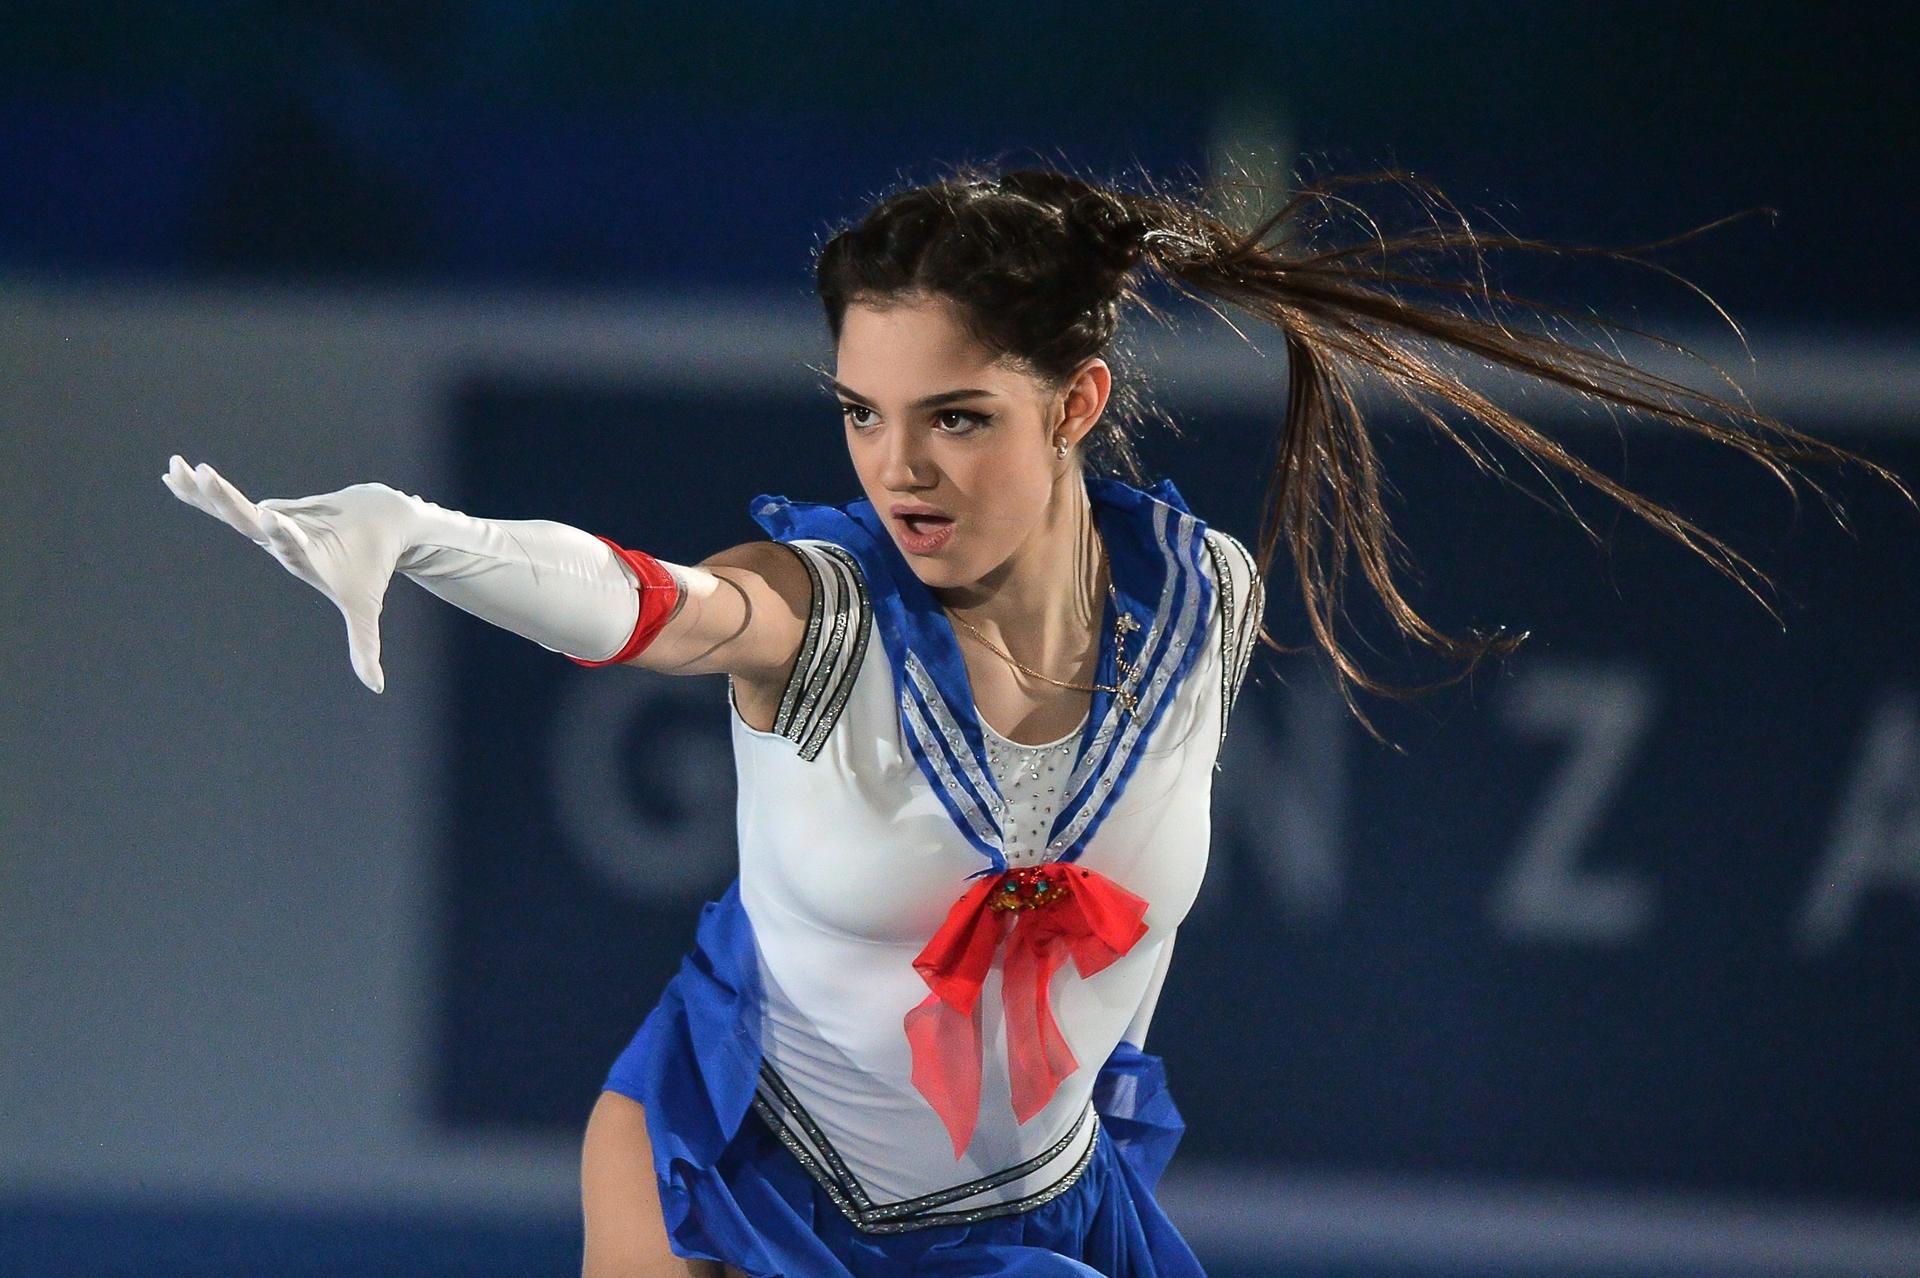 Evgenia Medvedeva | Медведева Евгения Армановна-6 - Страница 9 5dbb10e102e8bd0c8b5d5766